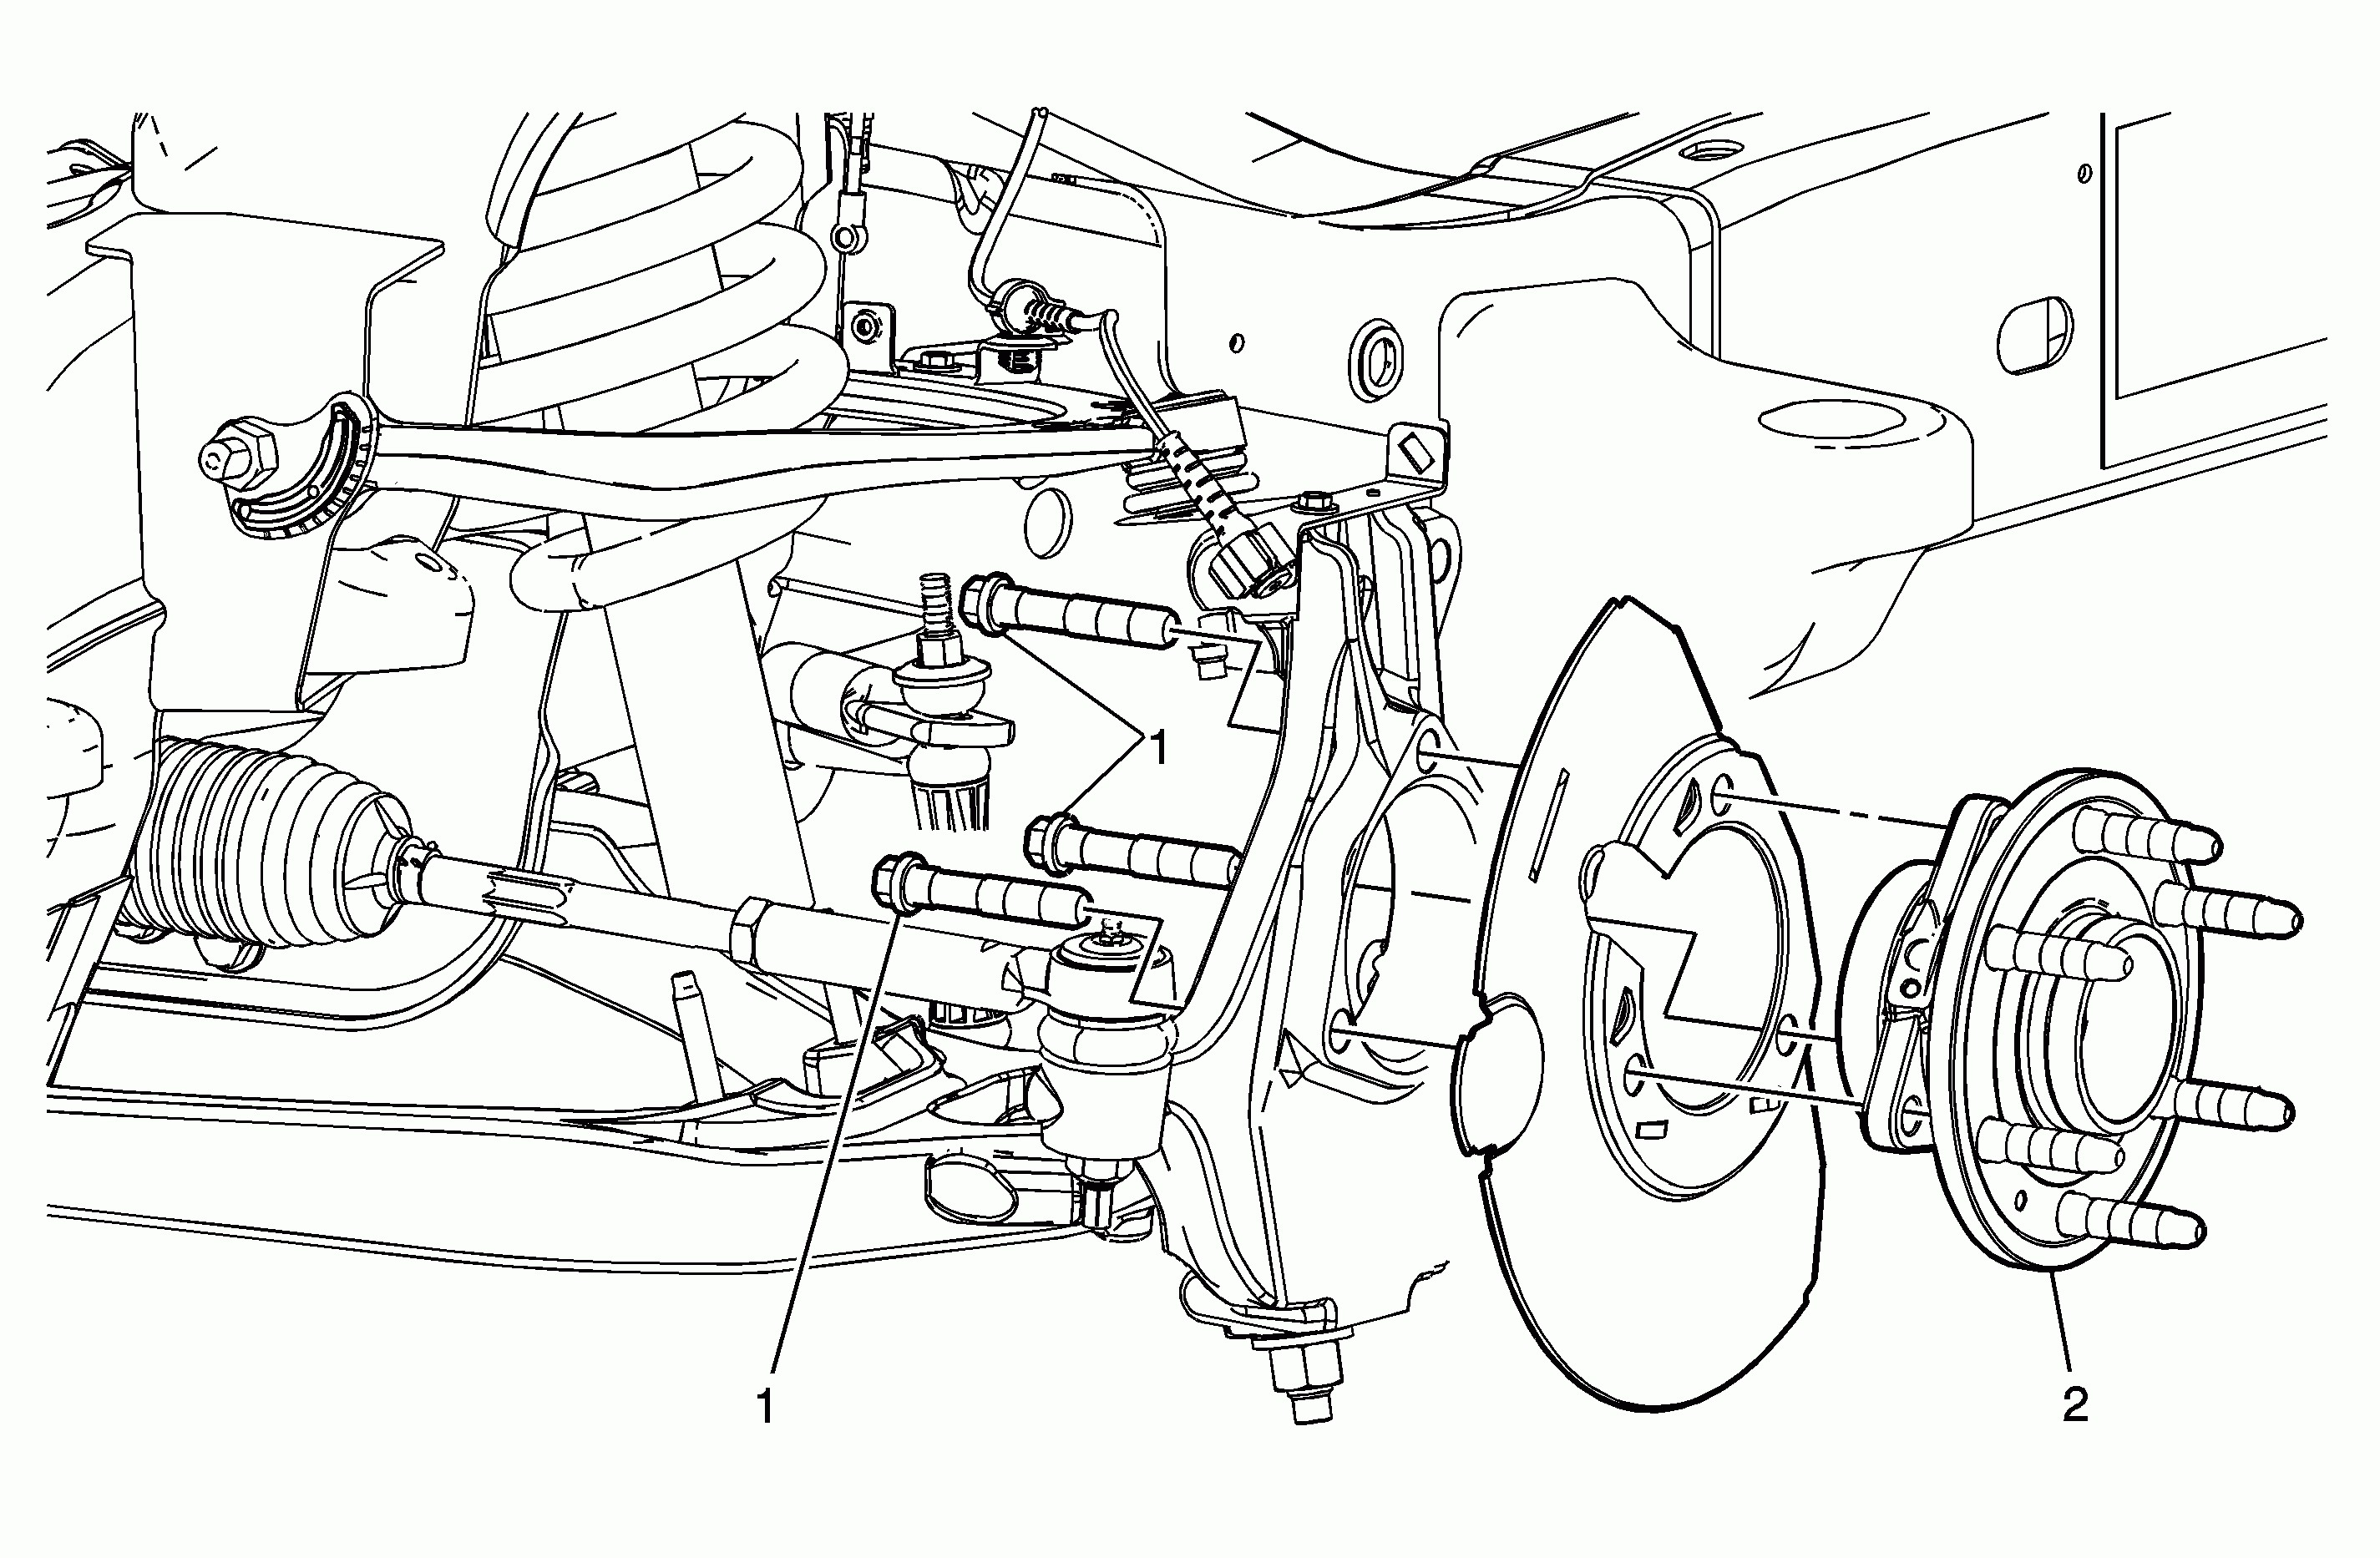 2001 Chevy Suburban Parts Diagram 2007 Chevrolet Suburban